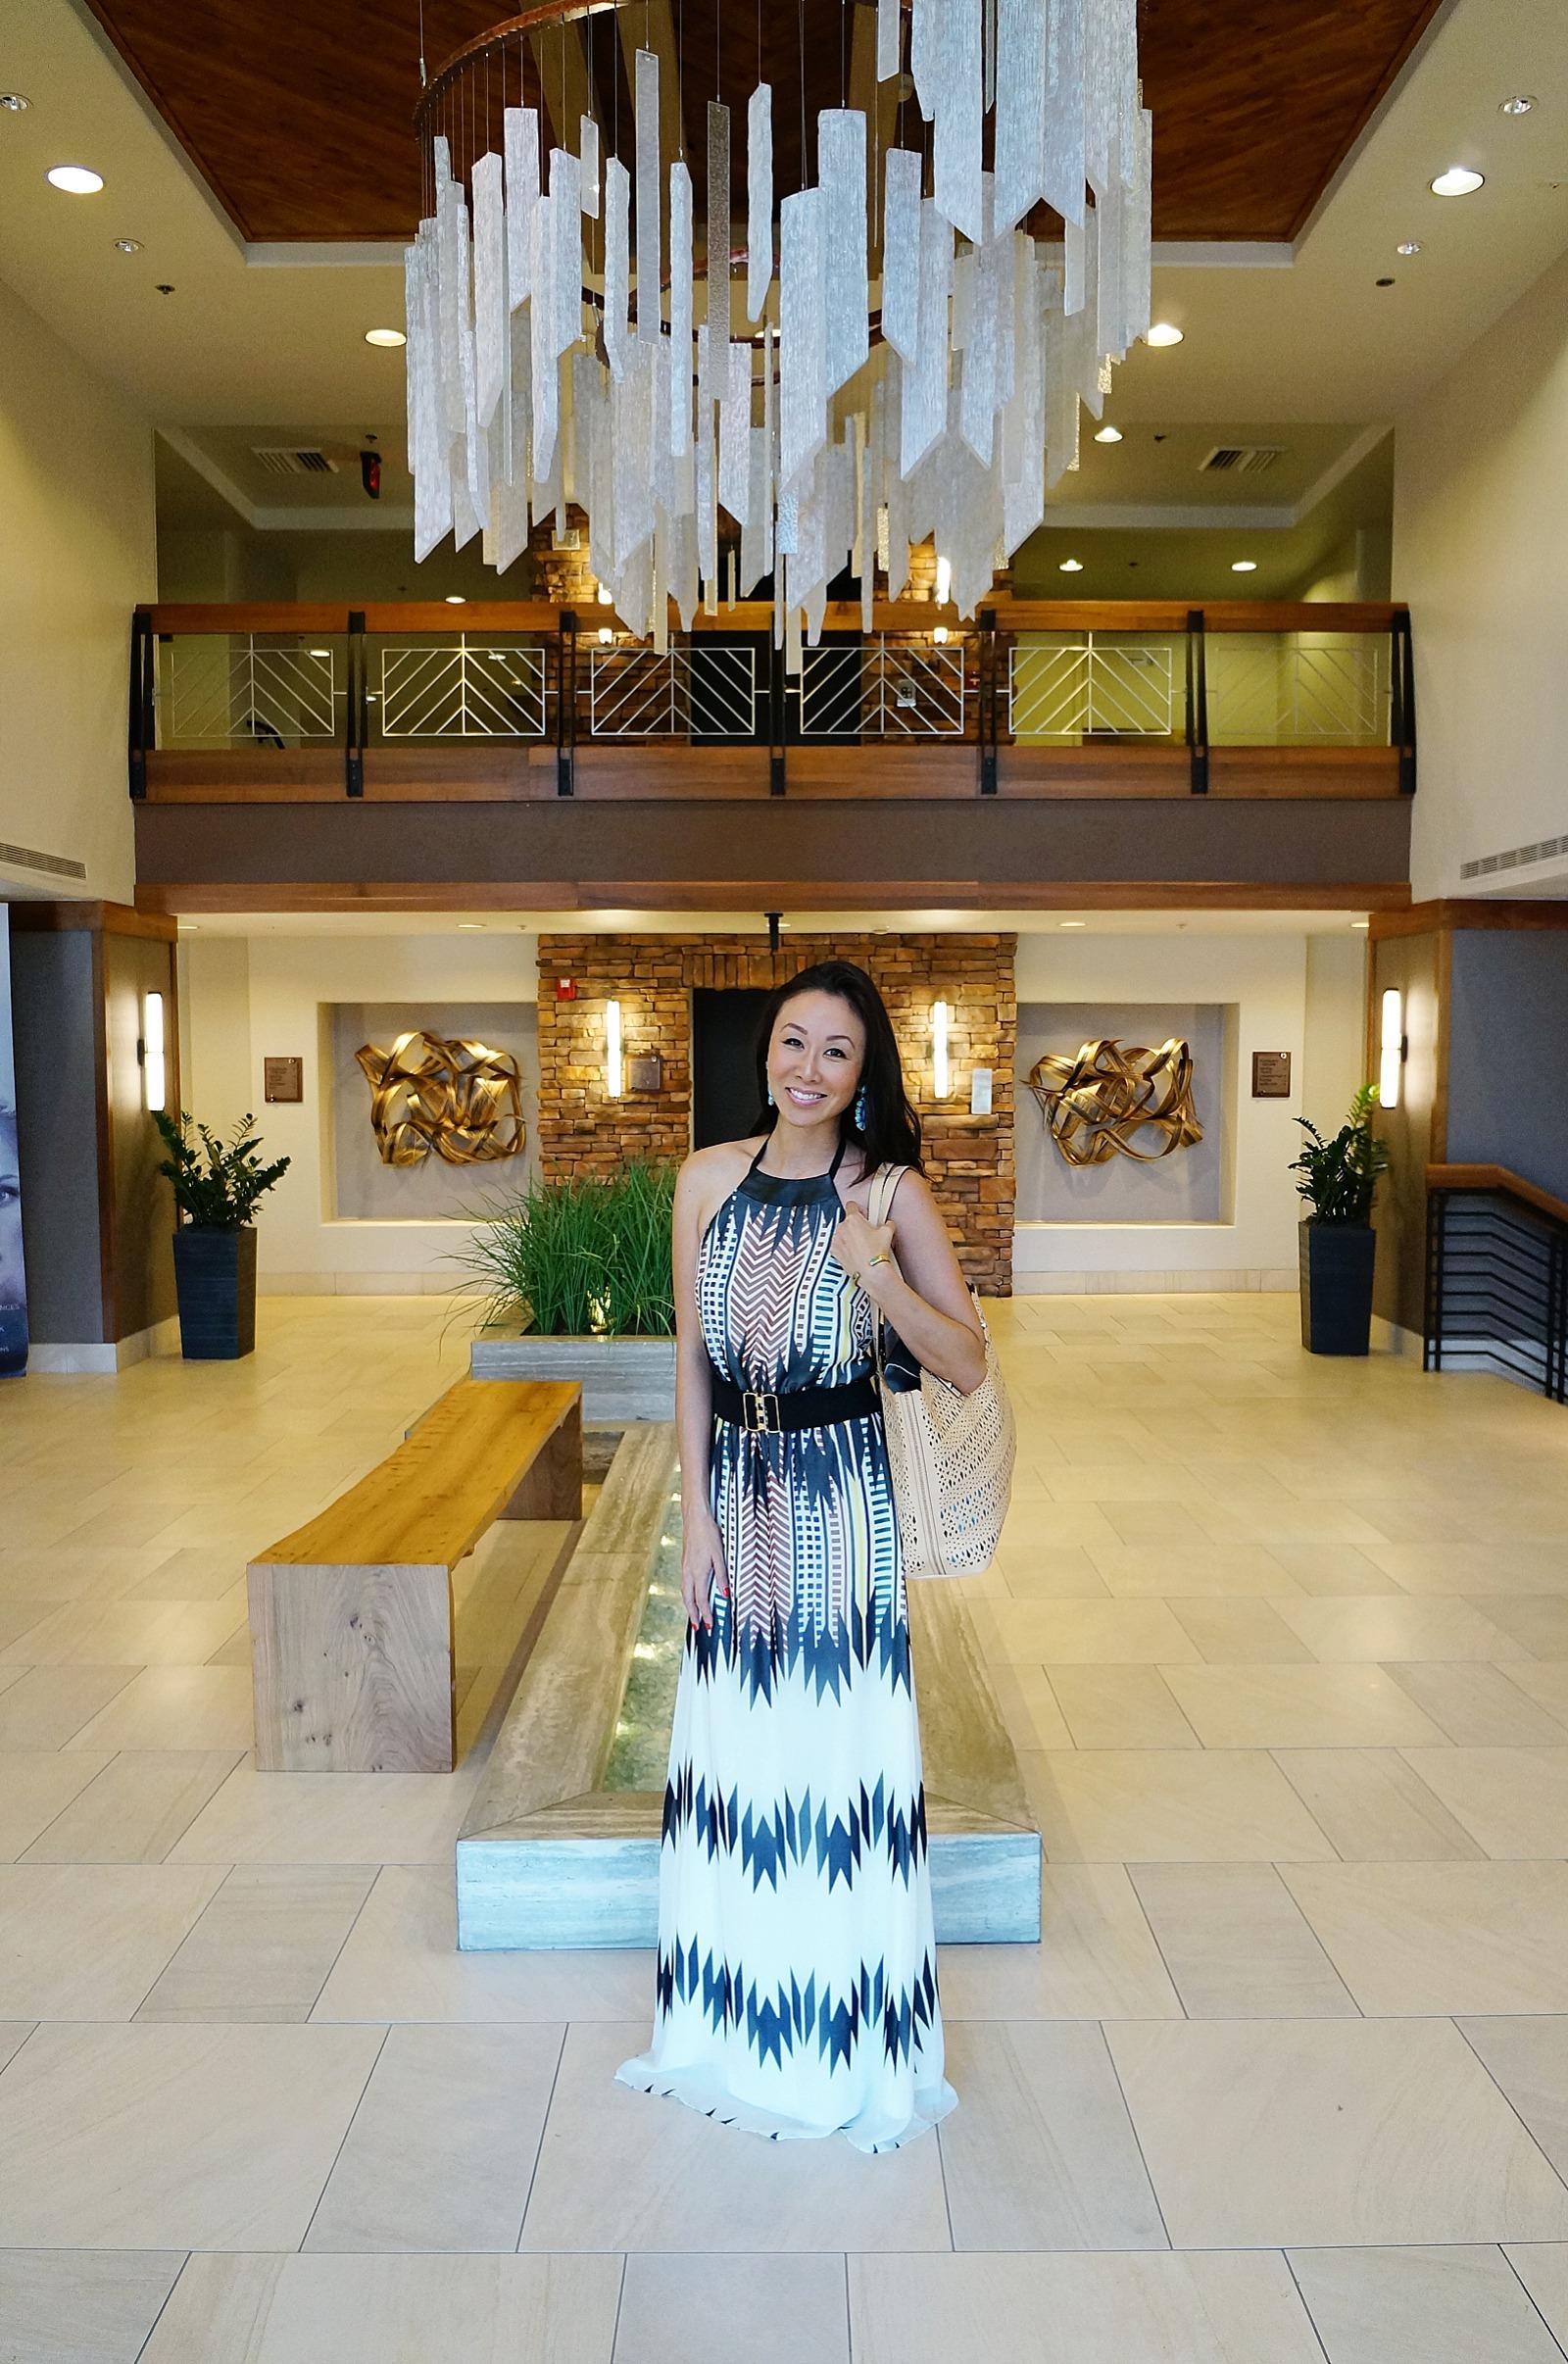 sedona-hilton-sedona-resort-bell-rock-travel-blogger-arizona-phoenix-review_0031